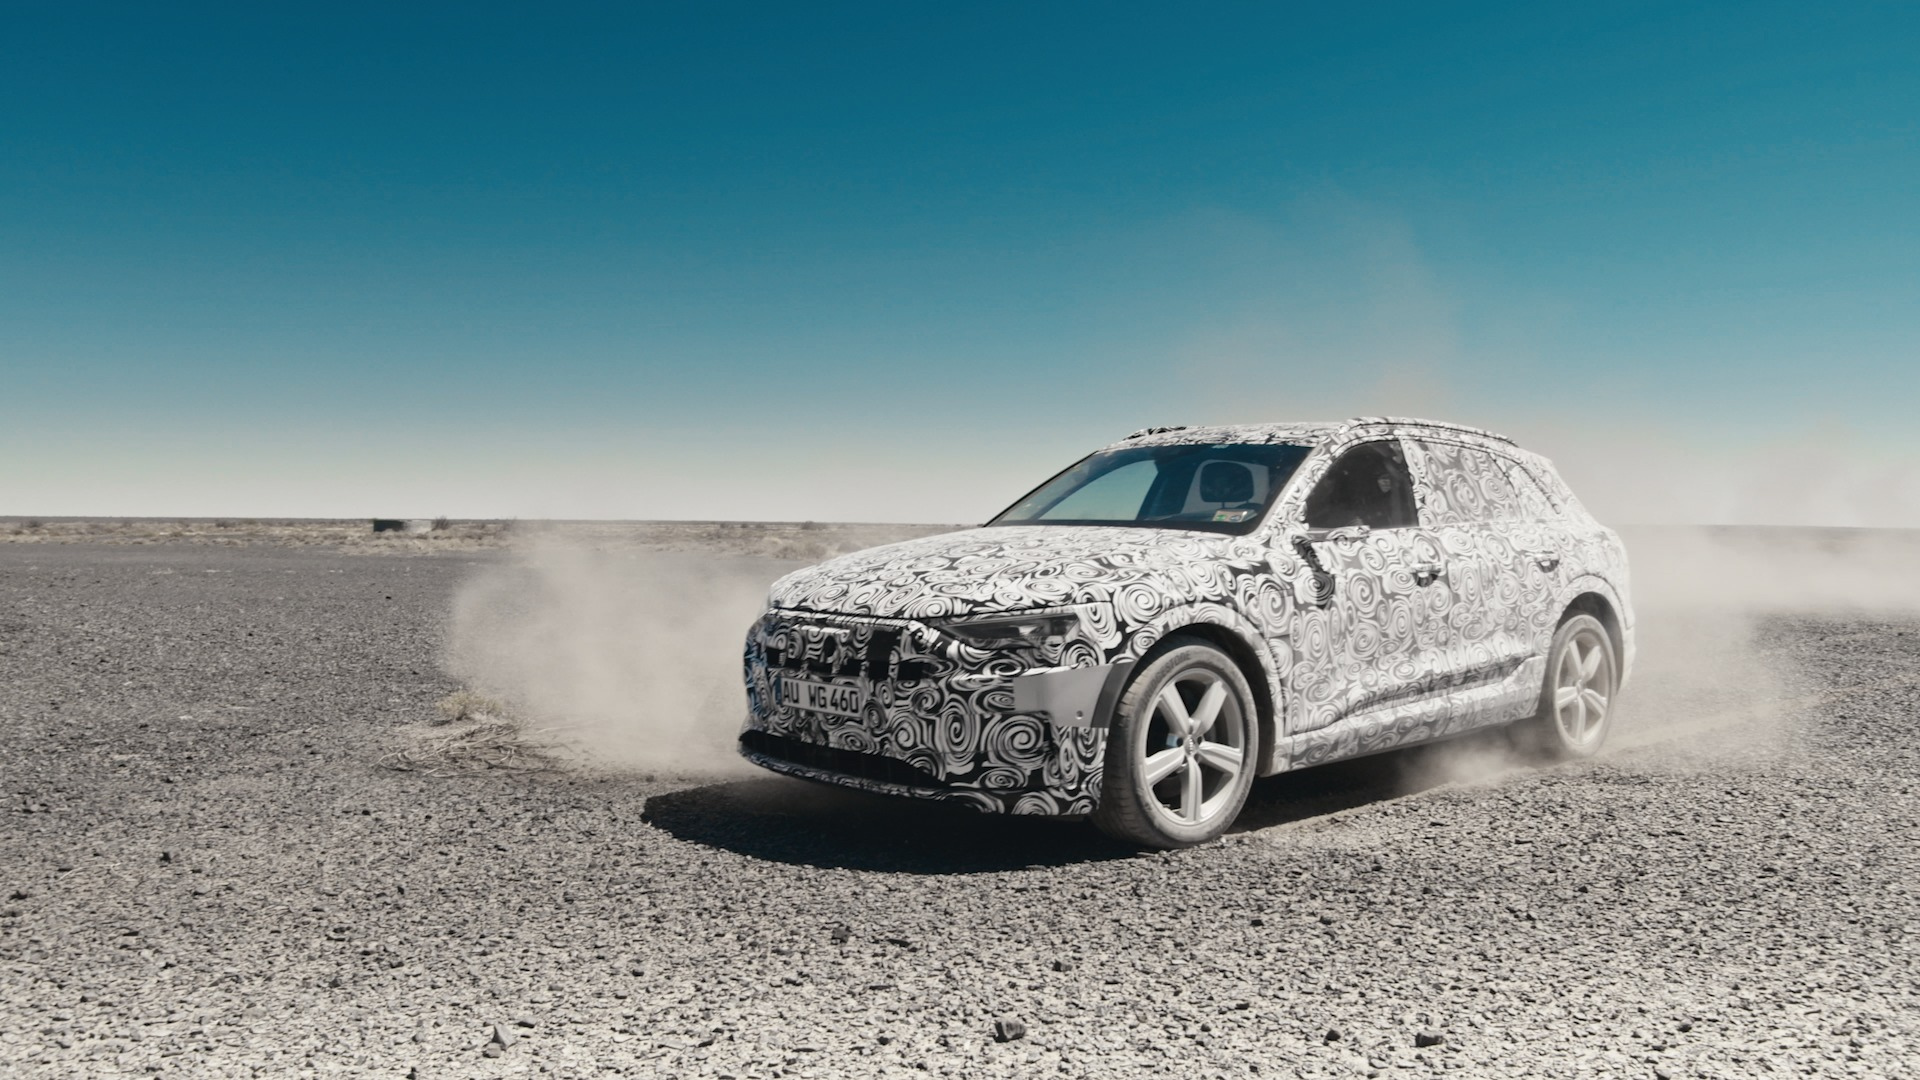 Trailer: the Audi e-tron prototype